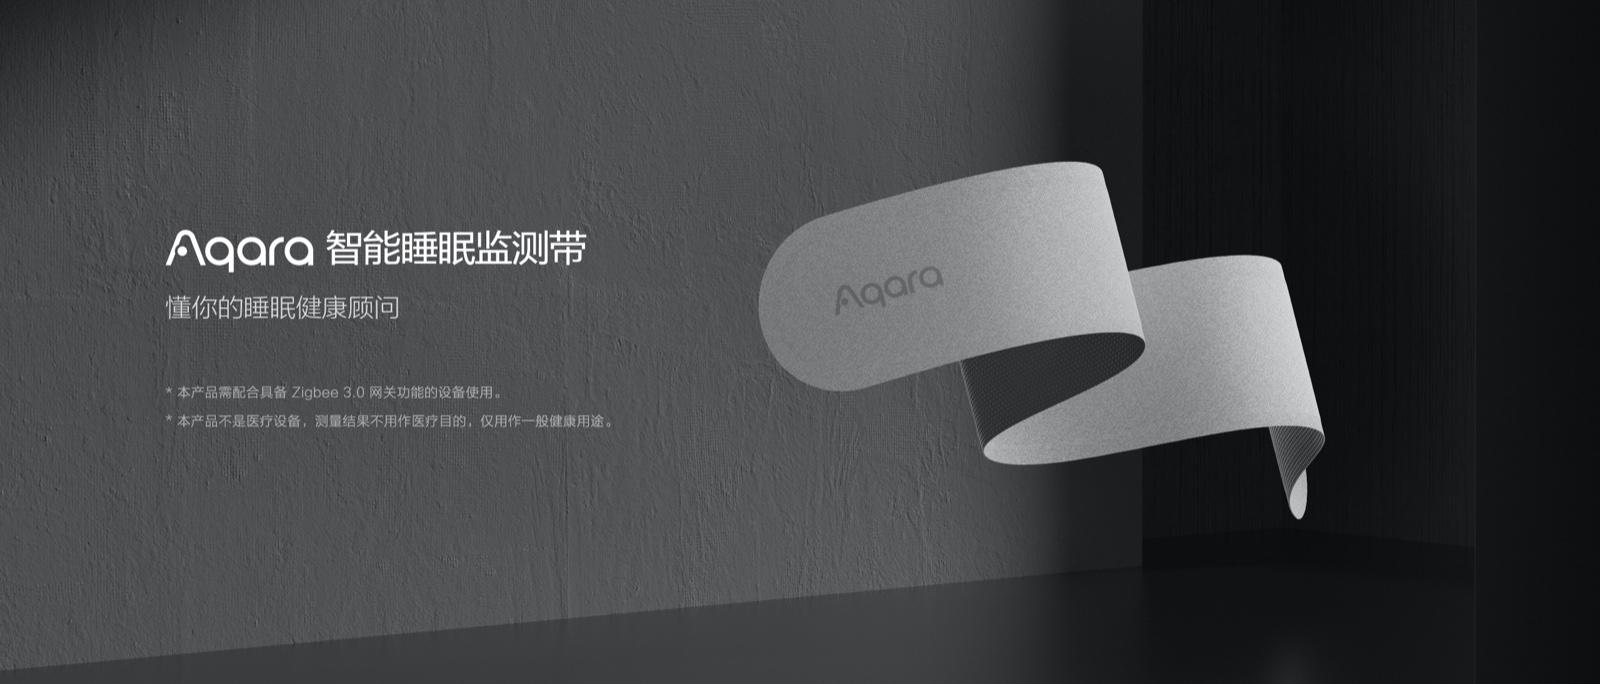 smart-sleep-monitor_01.jpg